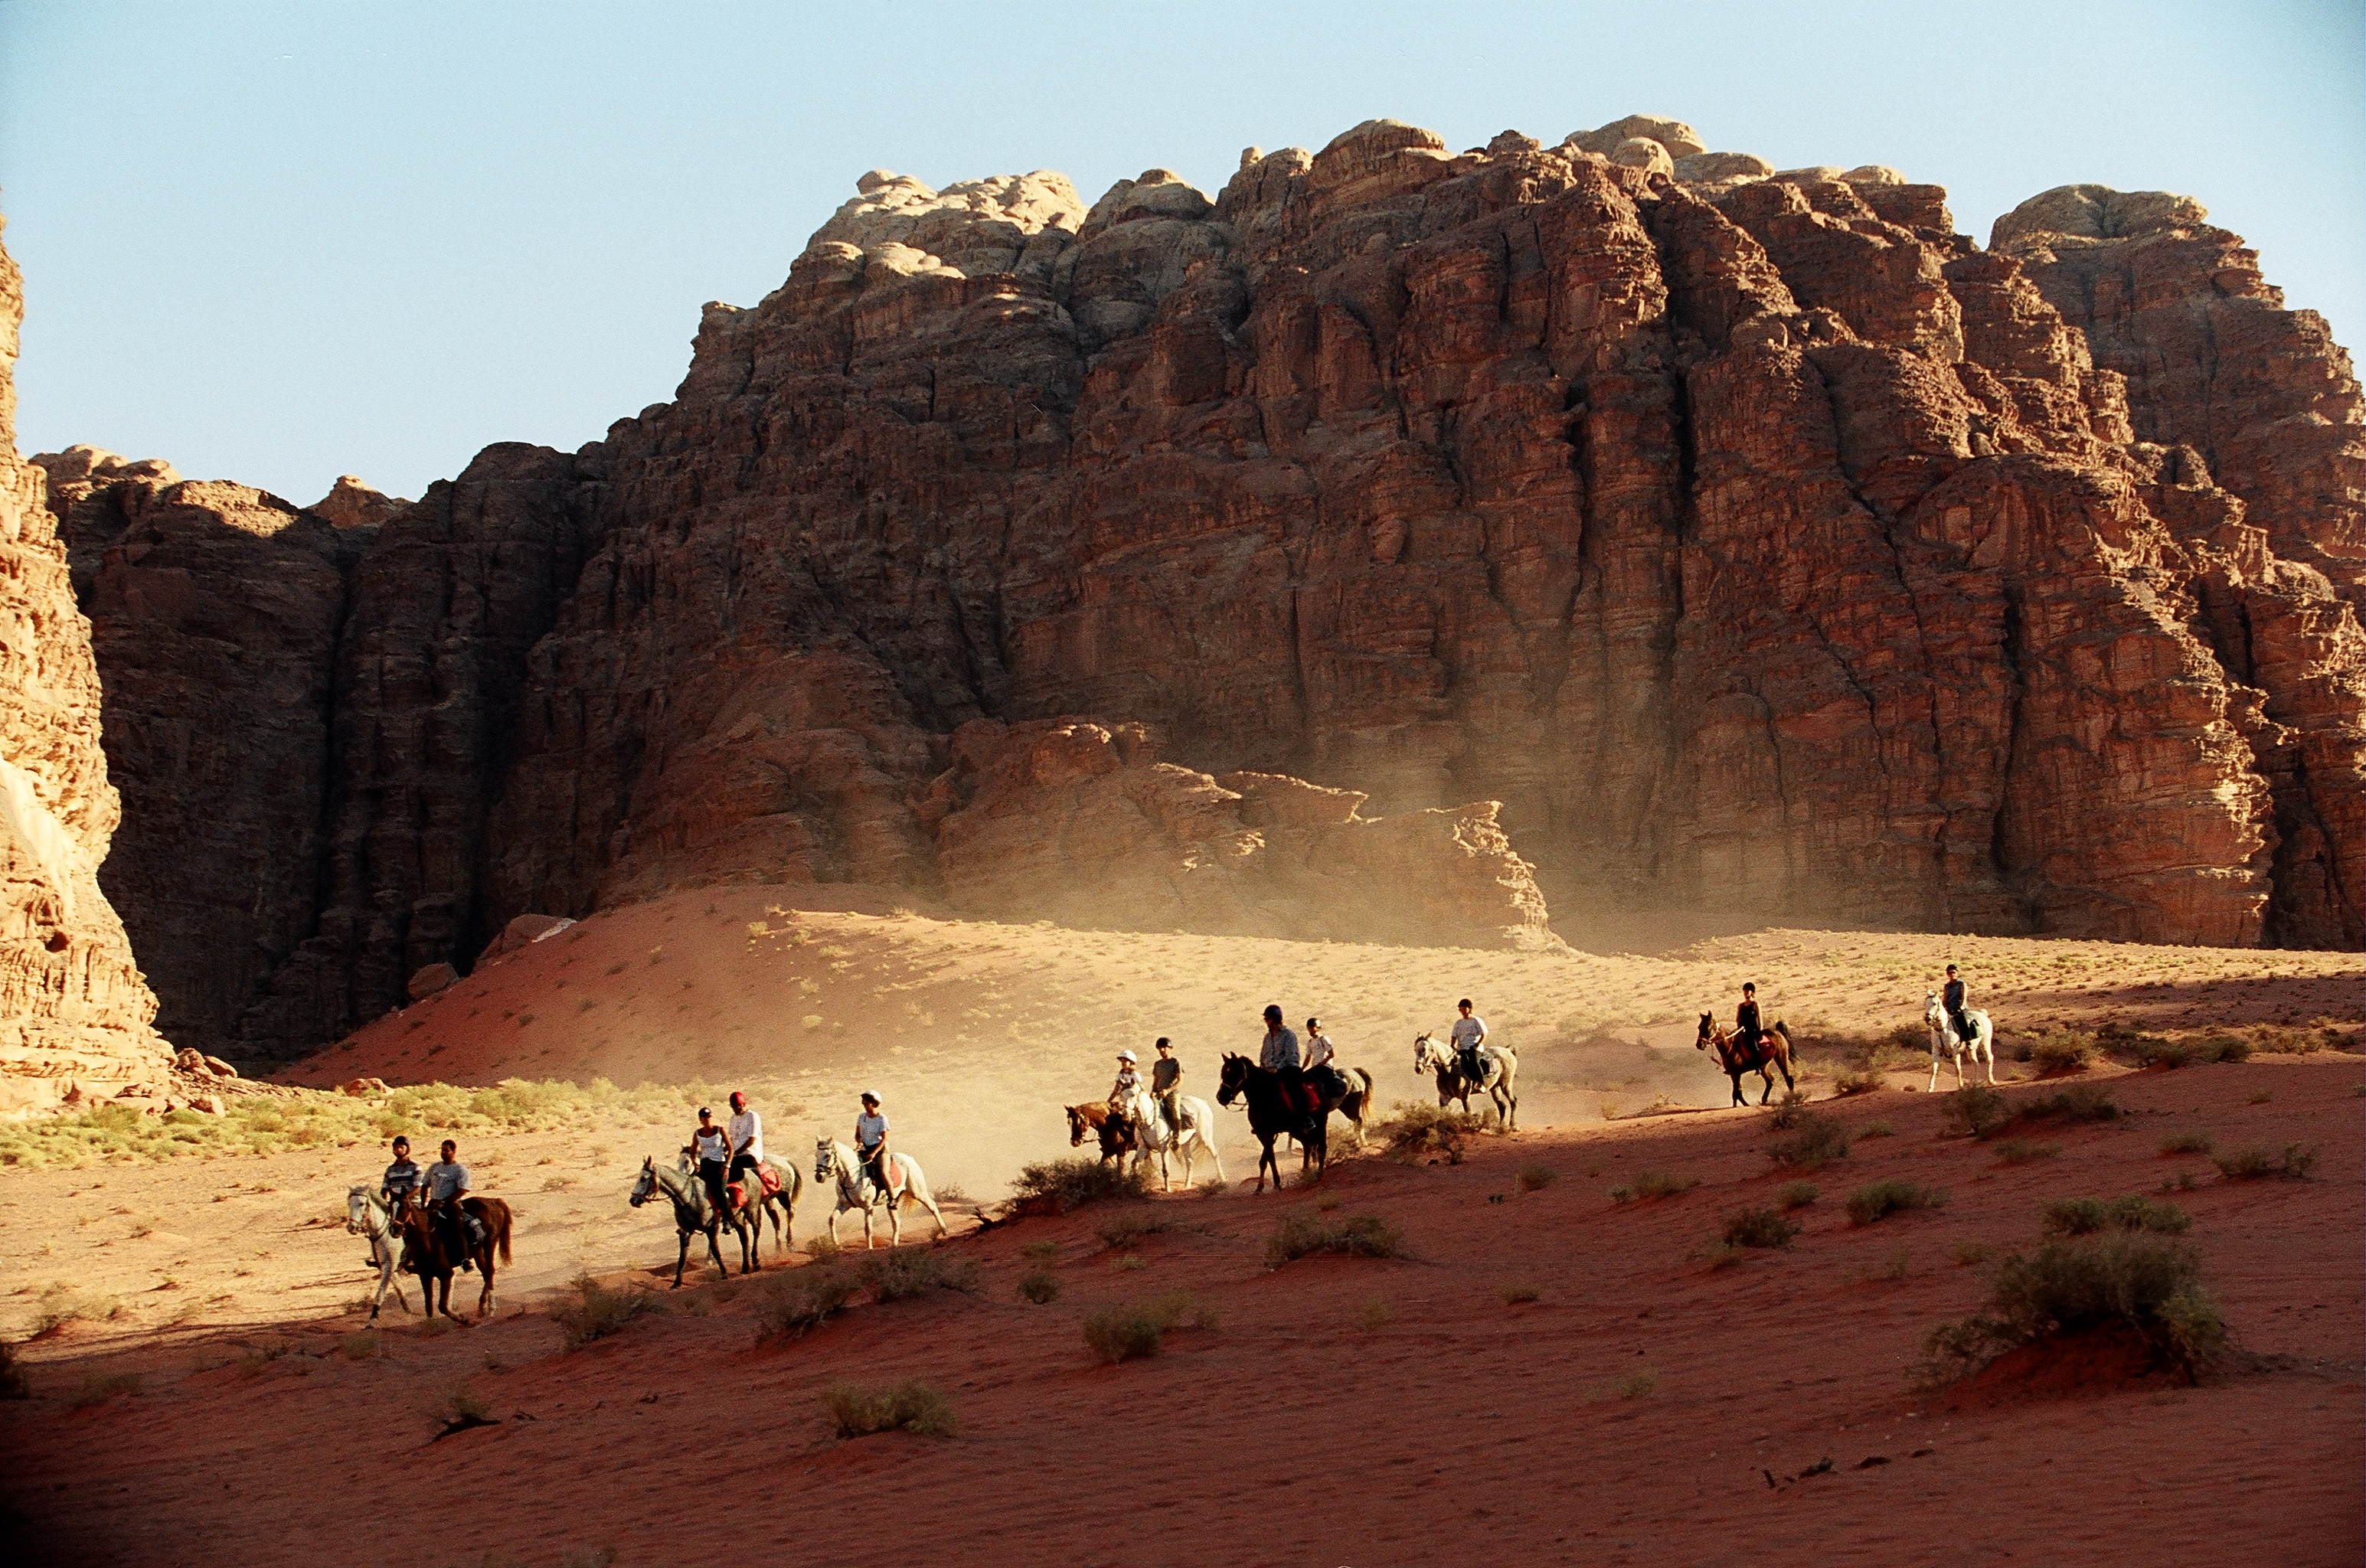 Horseback Riding in Wadi Rum